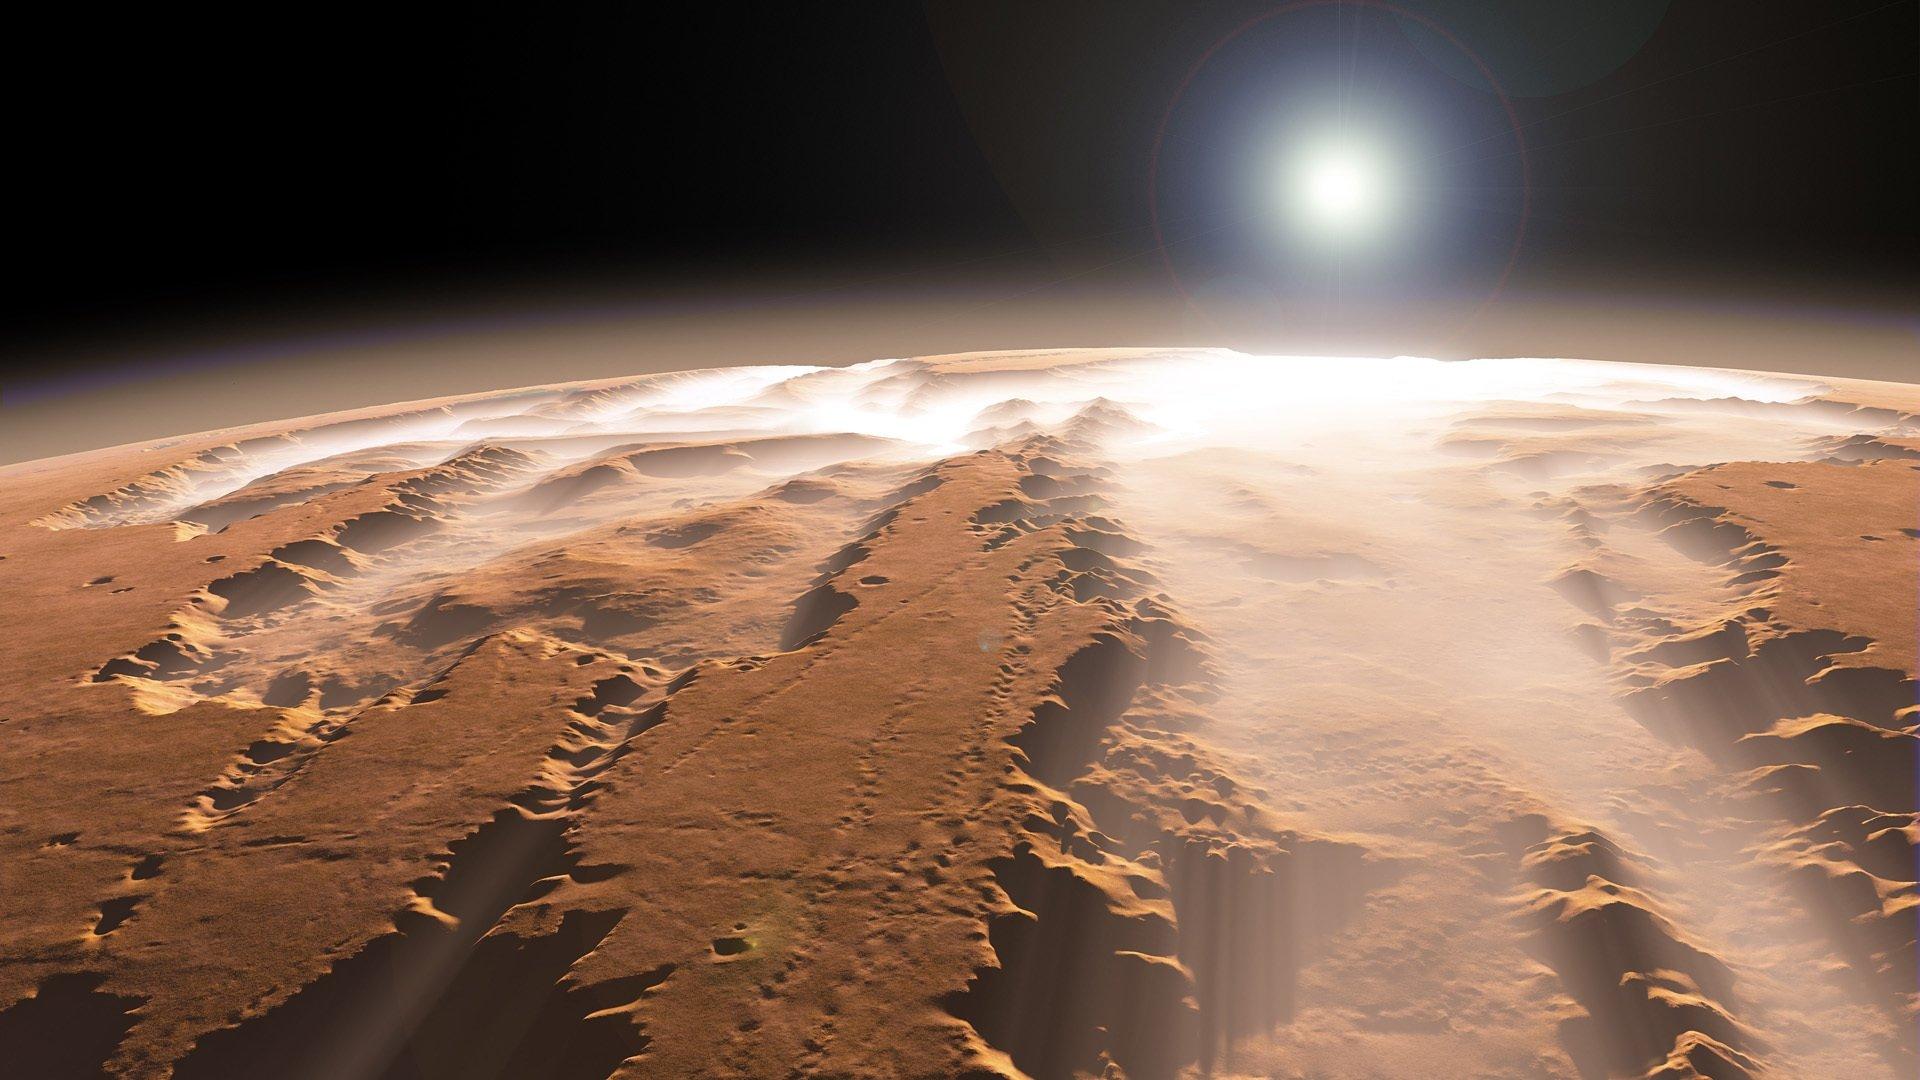 Mars Wallpaper 1920x1080